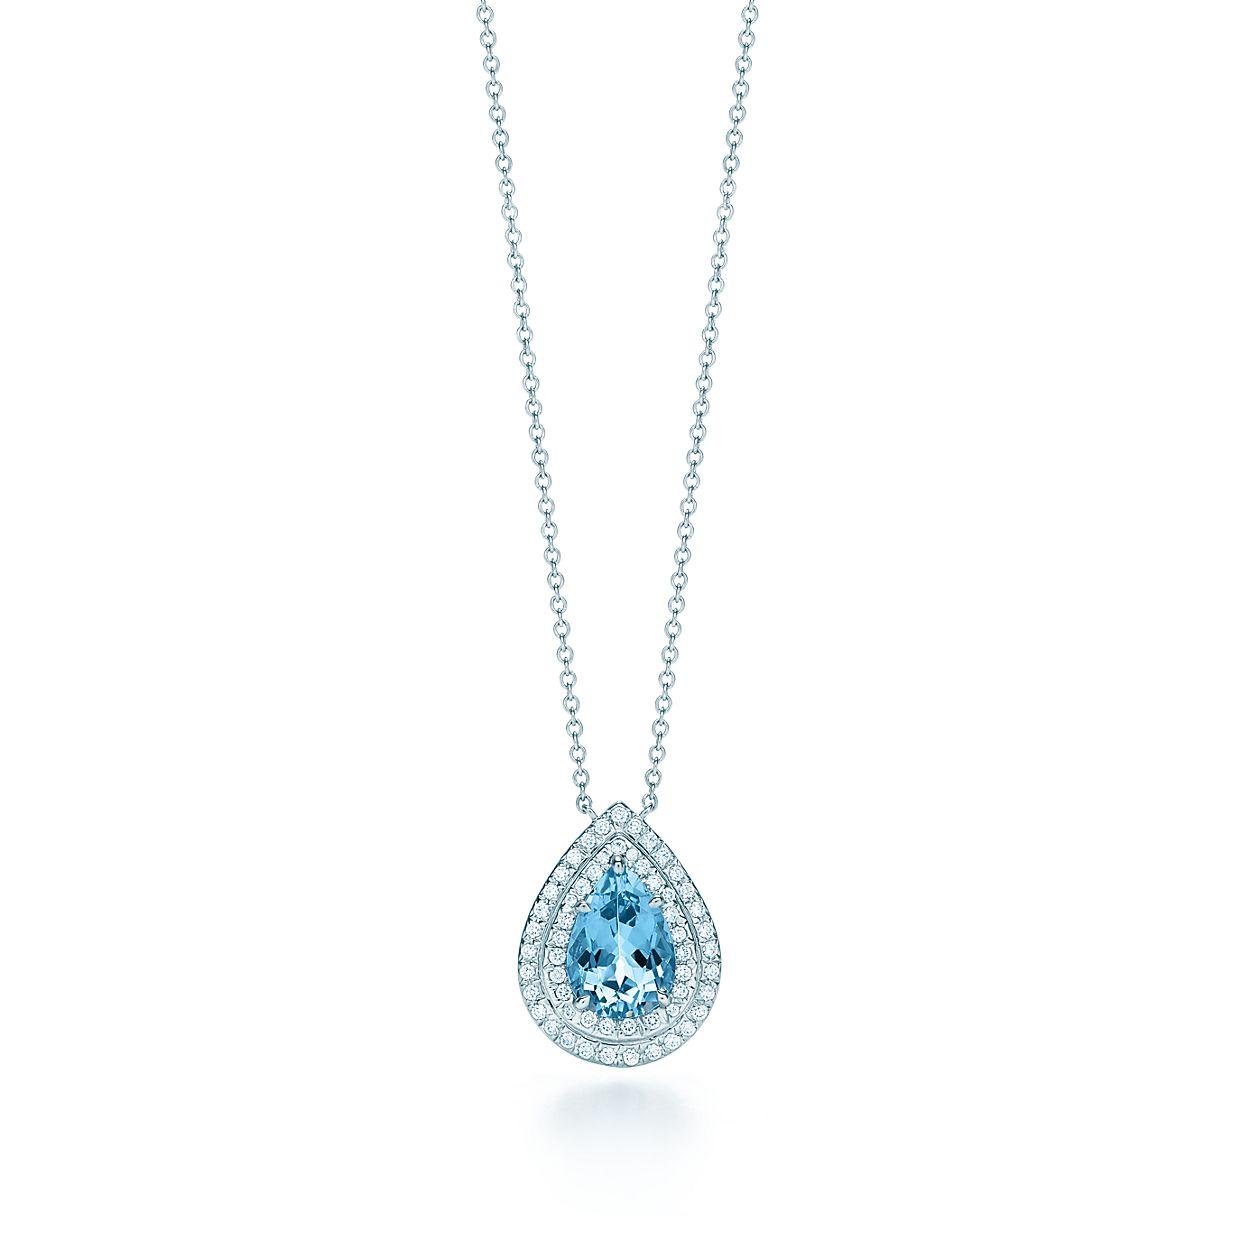 Tiffany soleste pendant in platinum with an aquamarine and diamonds tiffany solesteaquamarine and diamond pendant aloadofball Images